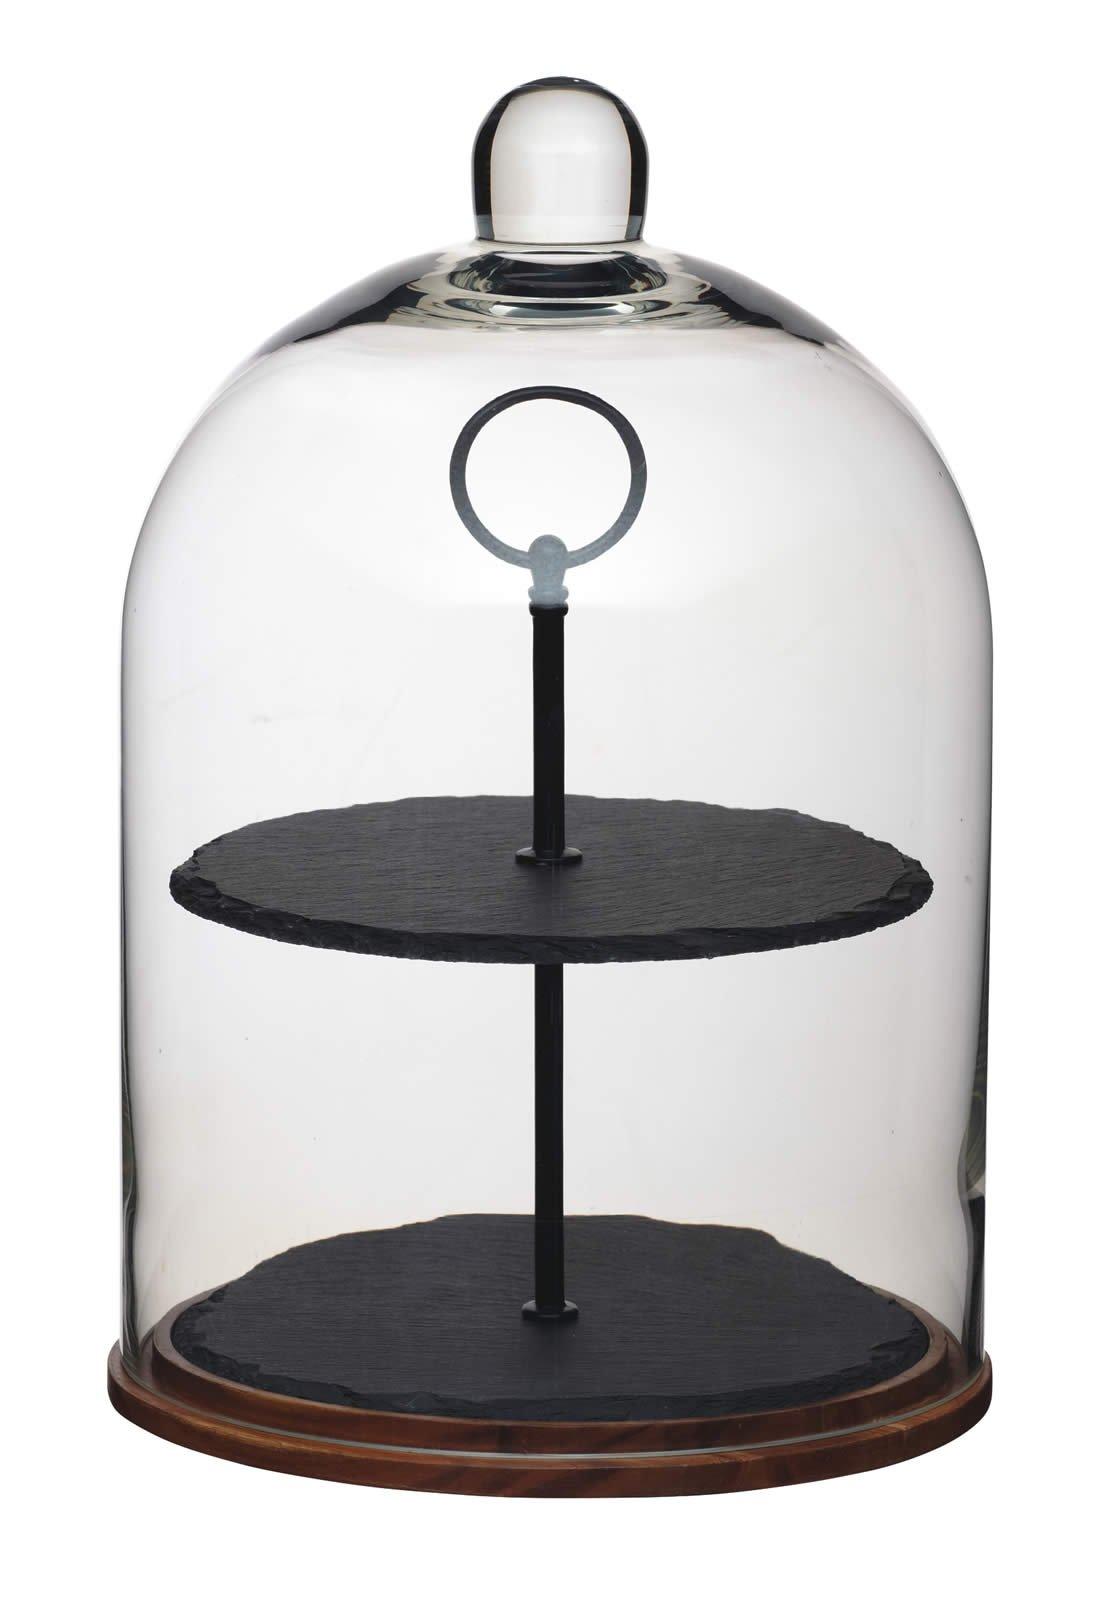 Masterclass Artesà 2-tier Serving Stand / Cake Dome, 22 x 31cm (8.5'' x 12'') by Artesa (Image #1)